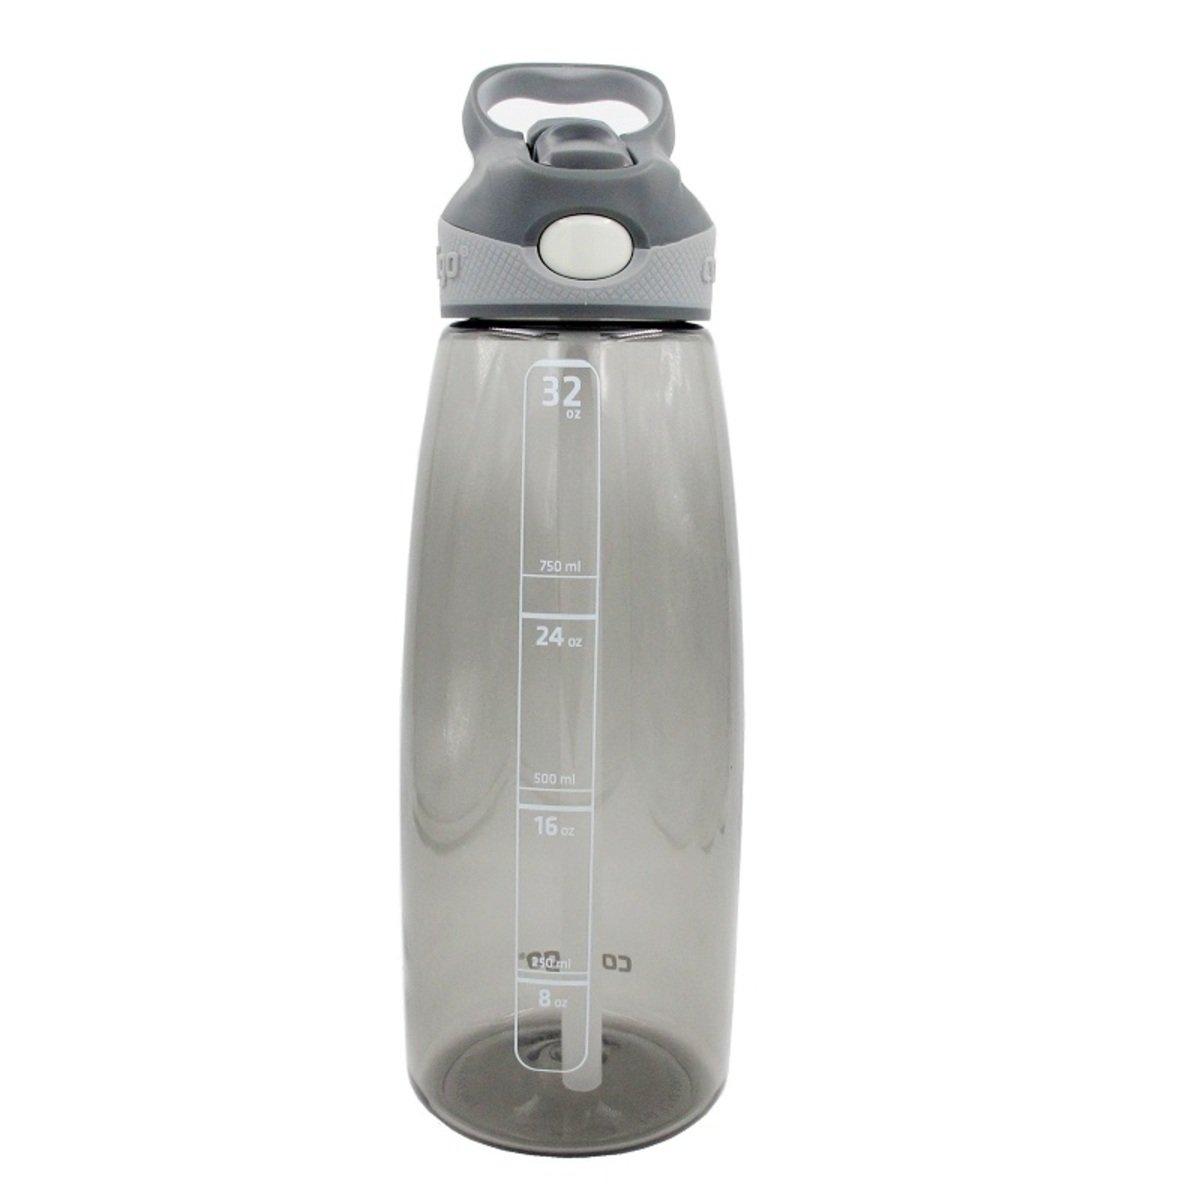 Addison 自動吸管運動杯 - 灰色